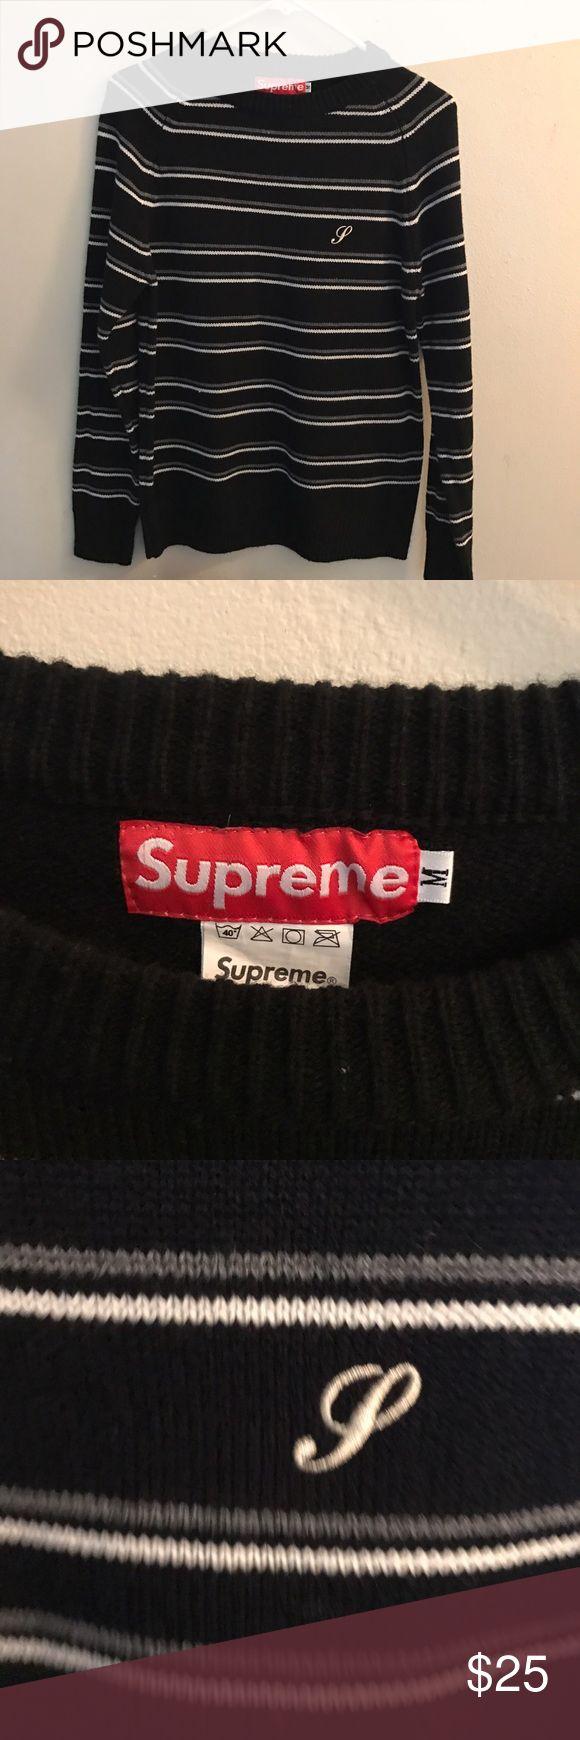 Supreme sweater Supreme sweater size medium Supreme Sweaters Crewneck